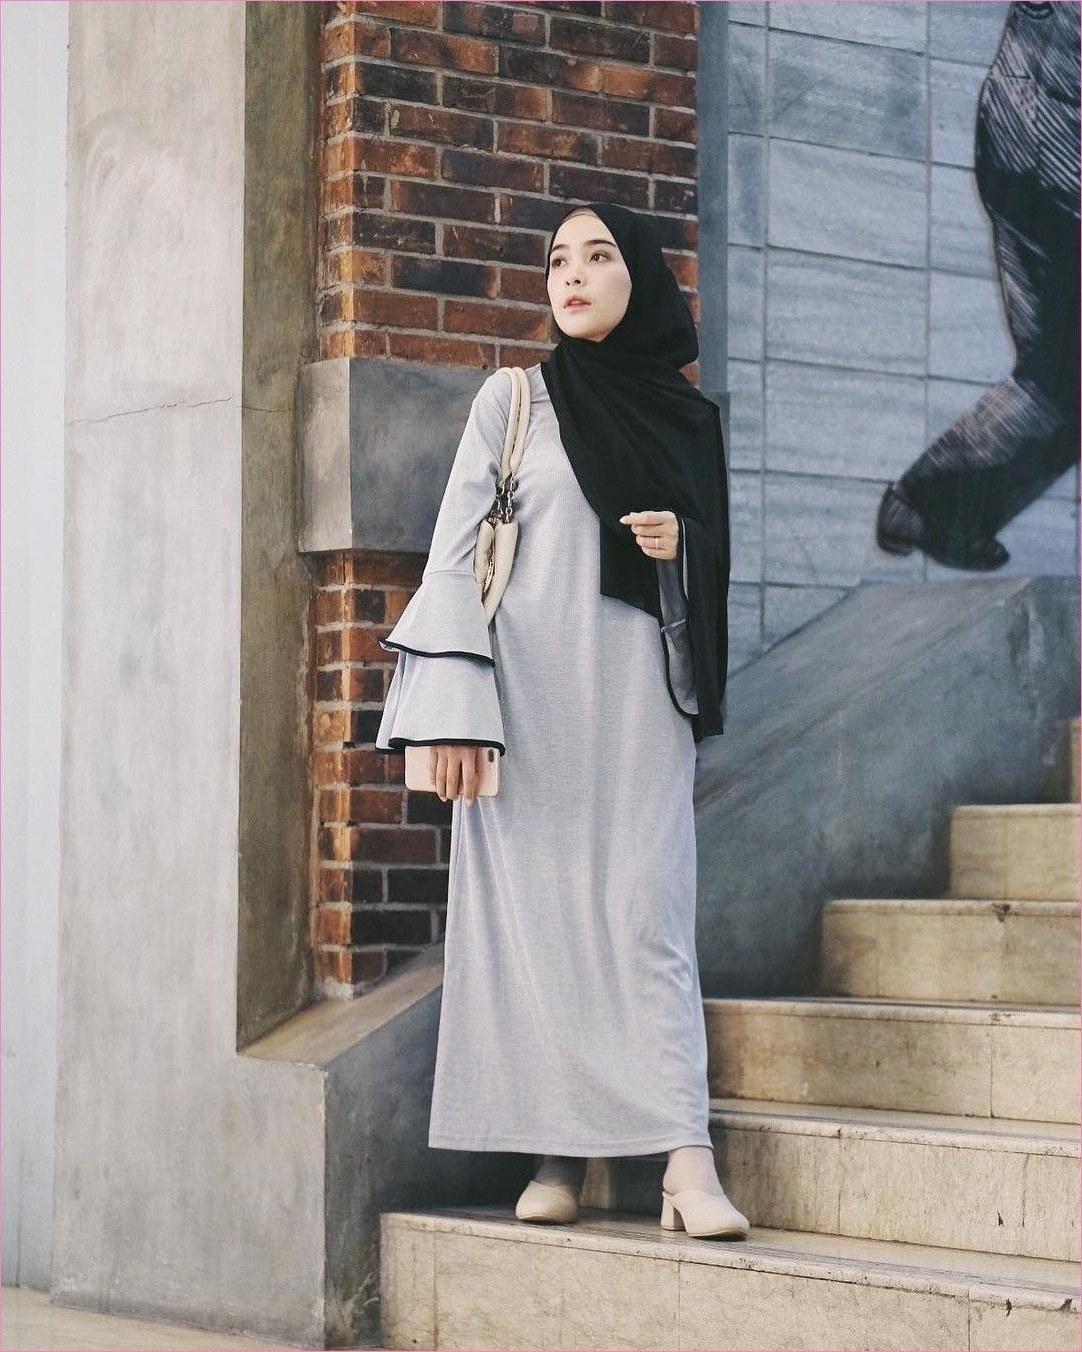 Design Ootd Baju Lebaran Remaja 2020 3id6 Outfit Baju Remaja Berhijab Ala Selebgram 2018 Pashmina